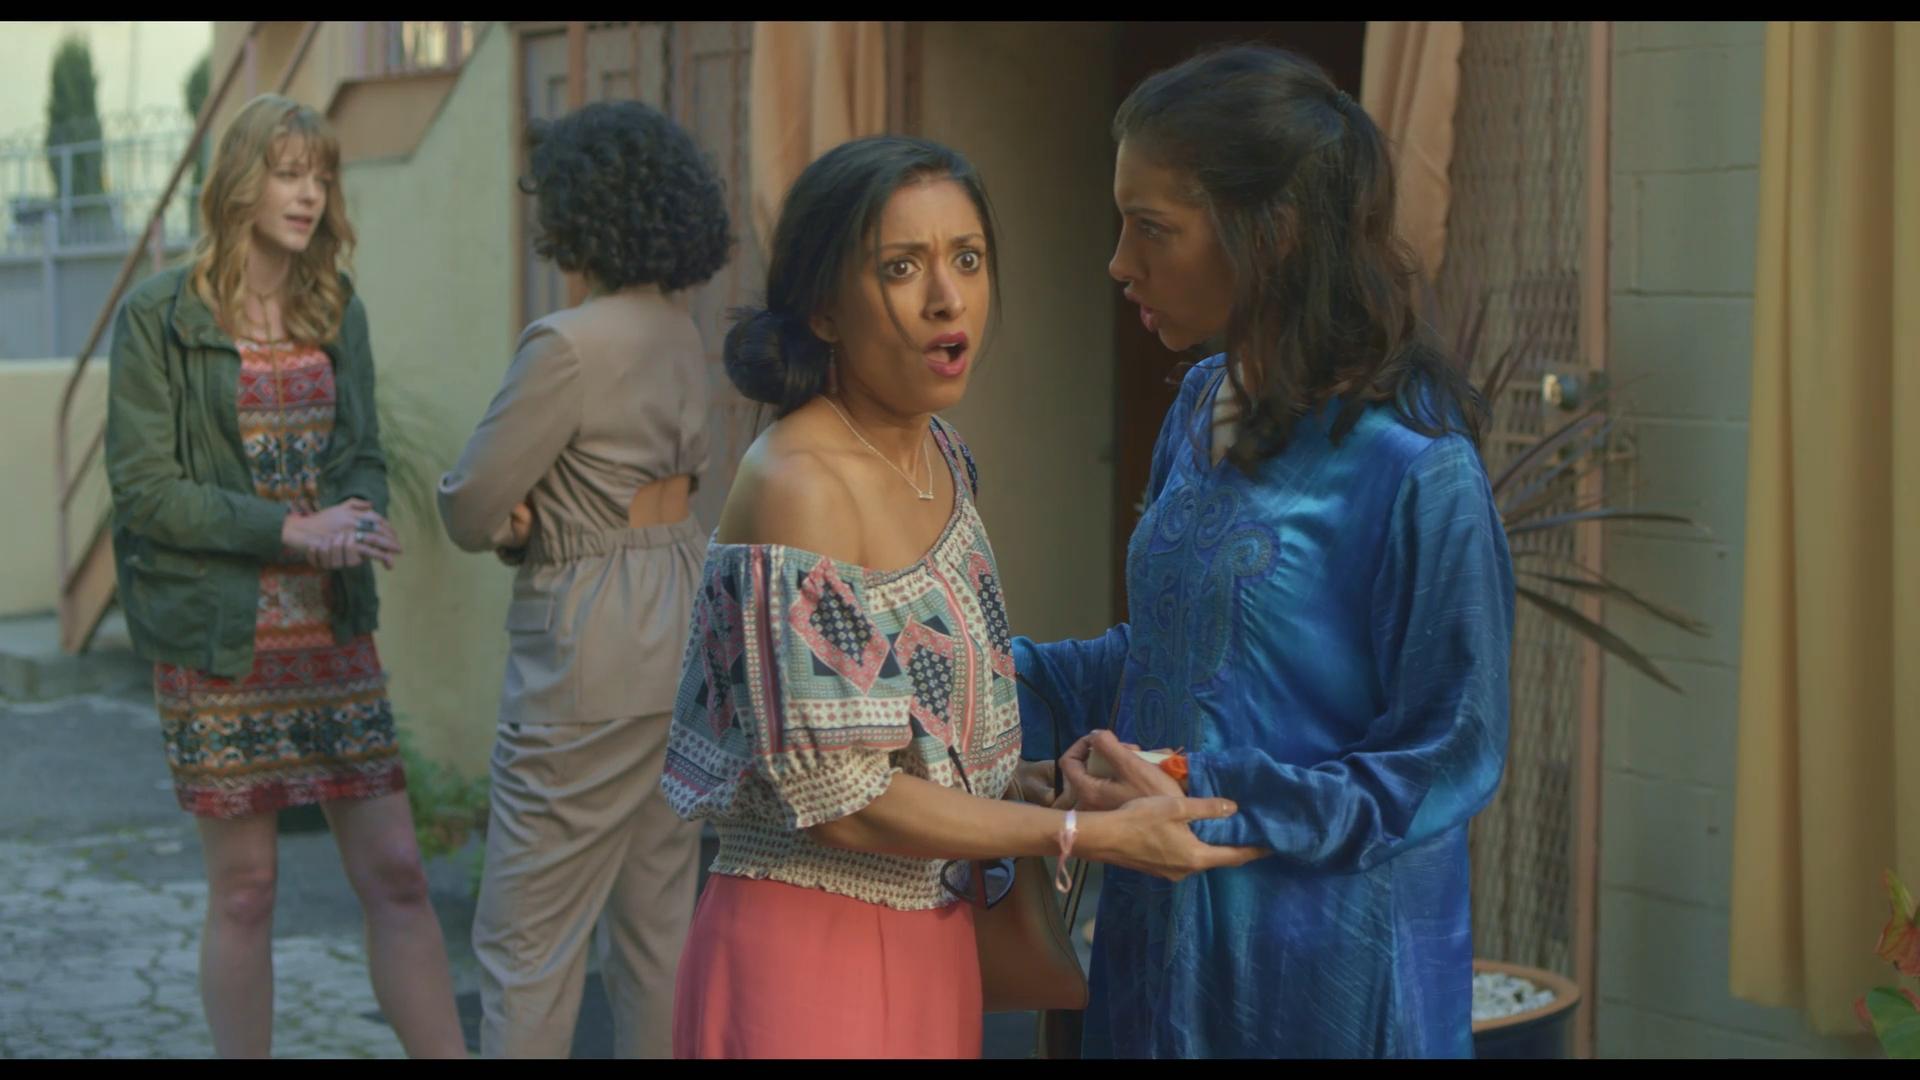 Veena Bidasha, Callie Schuttera, Nazanin Mandi, and Lovlee Carroll in The Last Conception (2020)